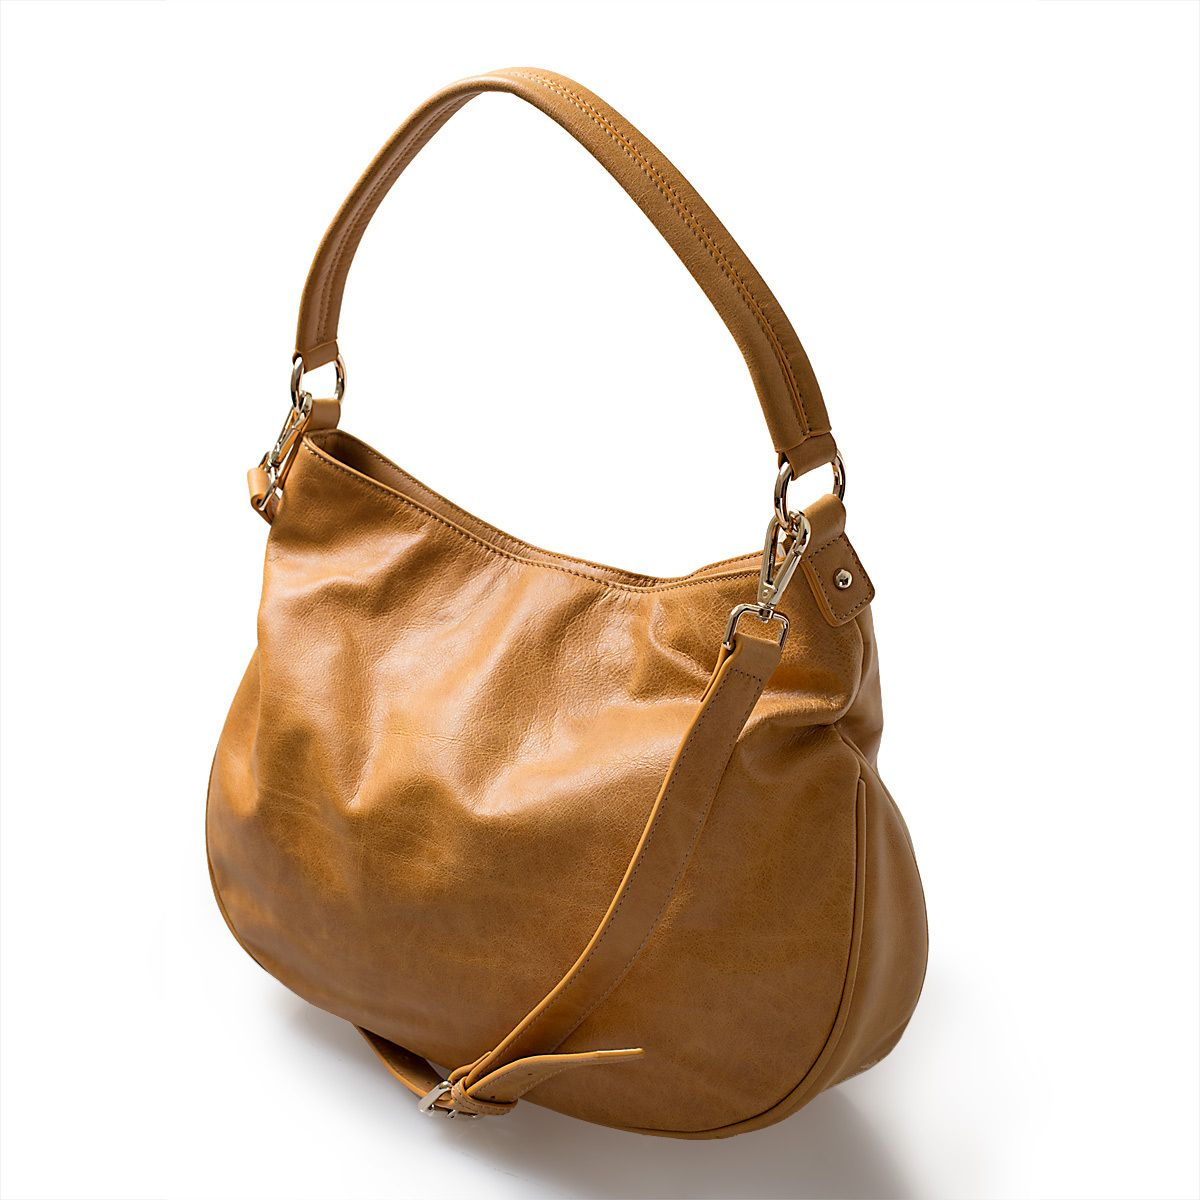 Mia Hobo - Dark Tan leather handbag - Marlie & Co.